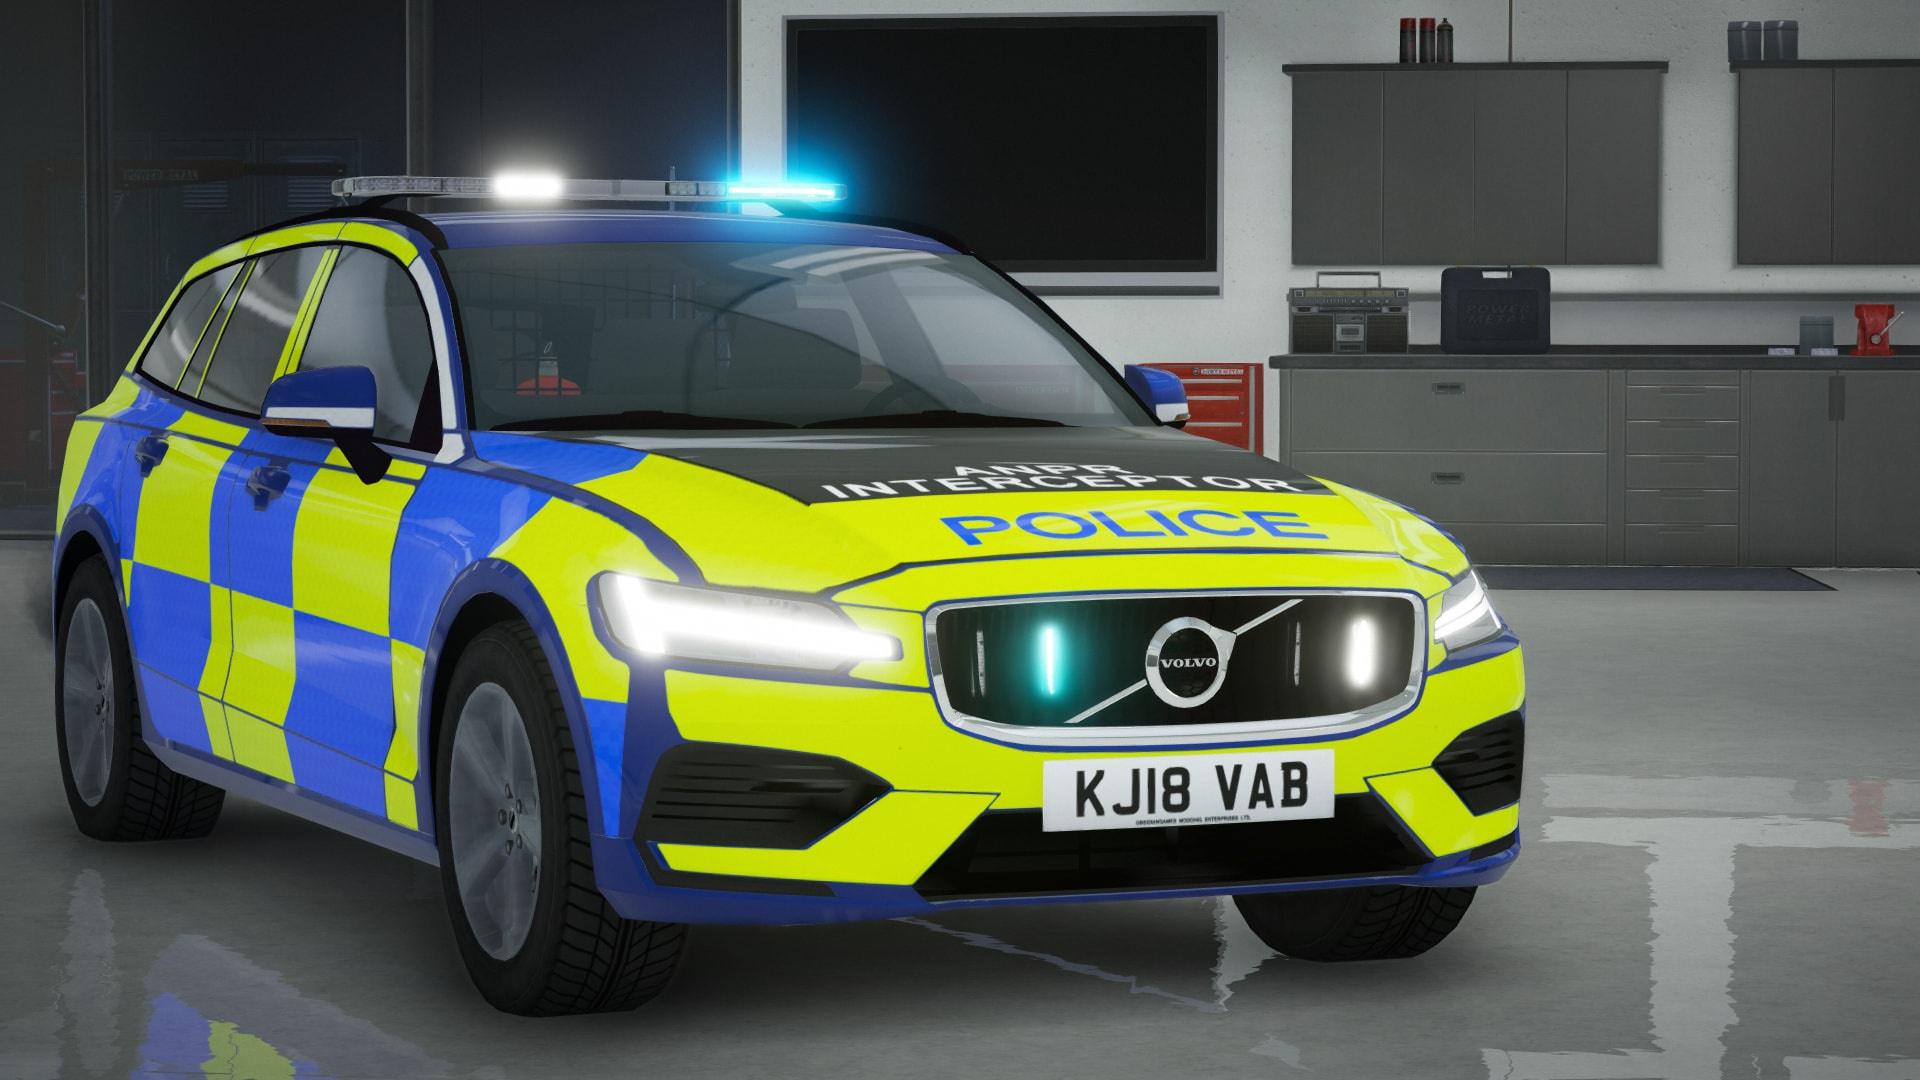 2019 Volvo V60 Police Demo Pack [ELS] - GTA5-Mods.com